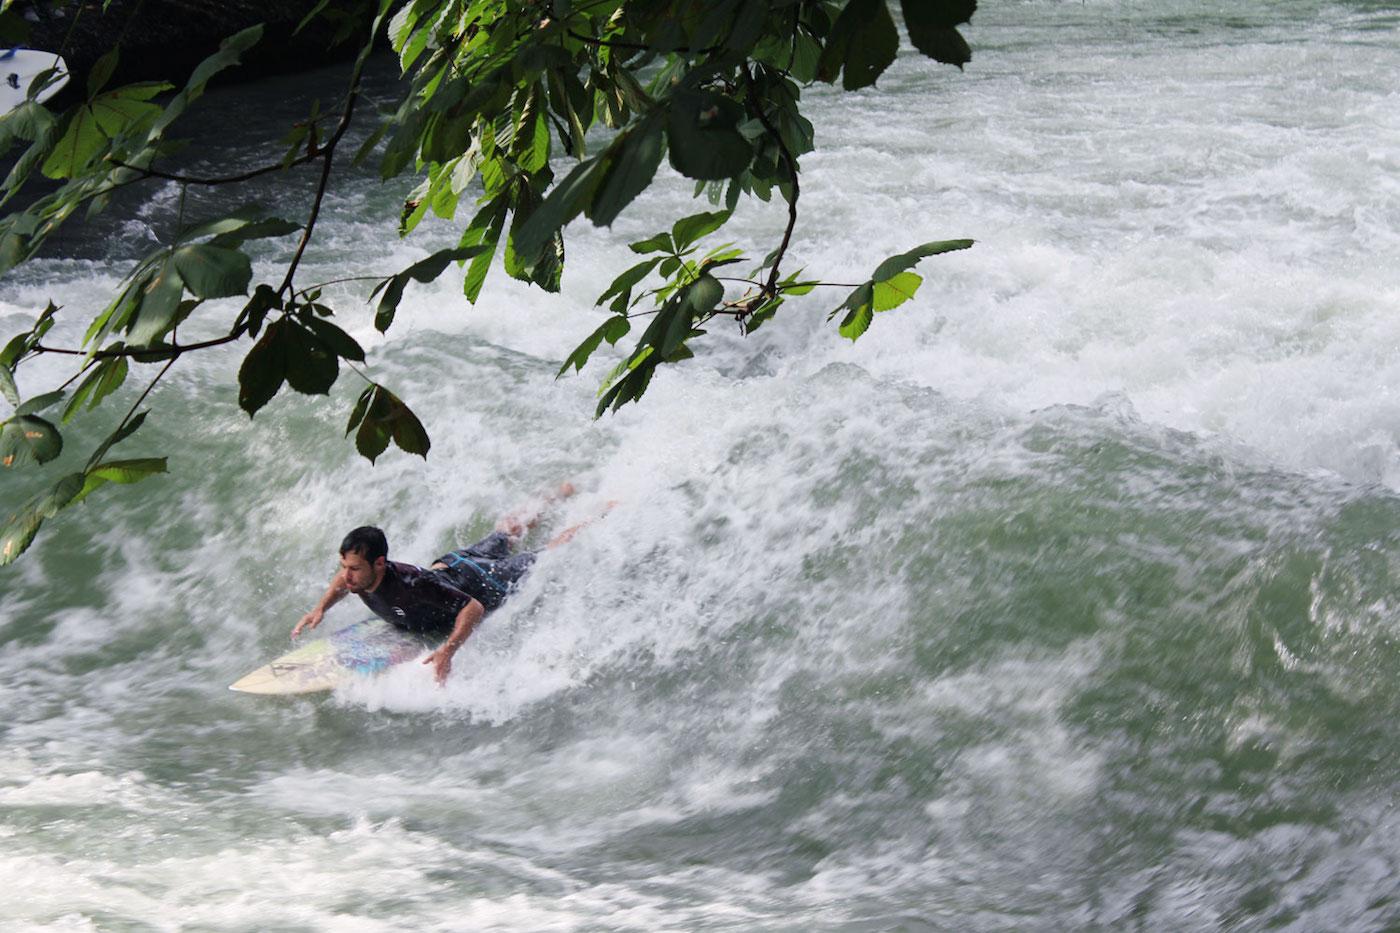 Englischer-Garten surfen Munchen hotspots